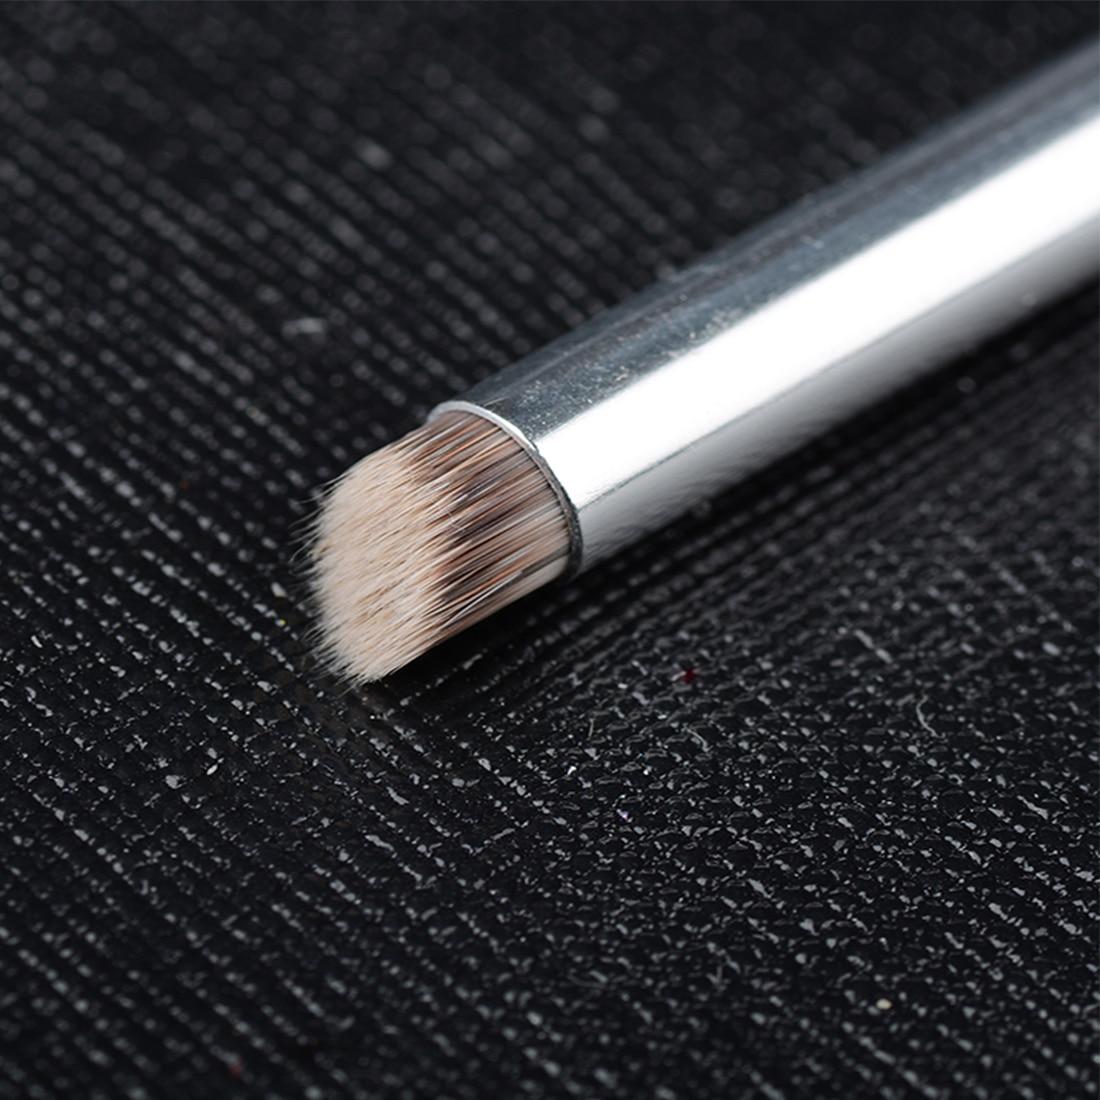 Manicure Painting Shanding Pen DIY Salon Drawing Tool Dark Red Wood Handle Nylon Hair Ombre Gradient Nail Art Gel Brush